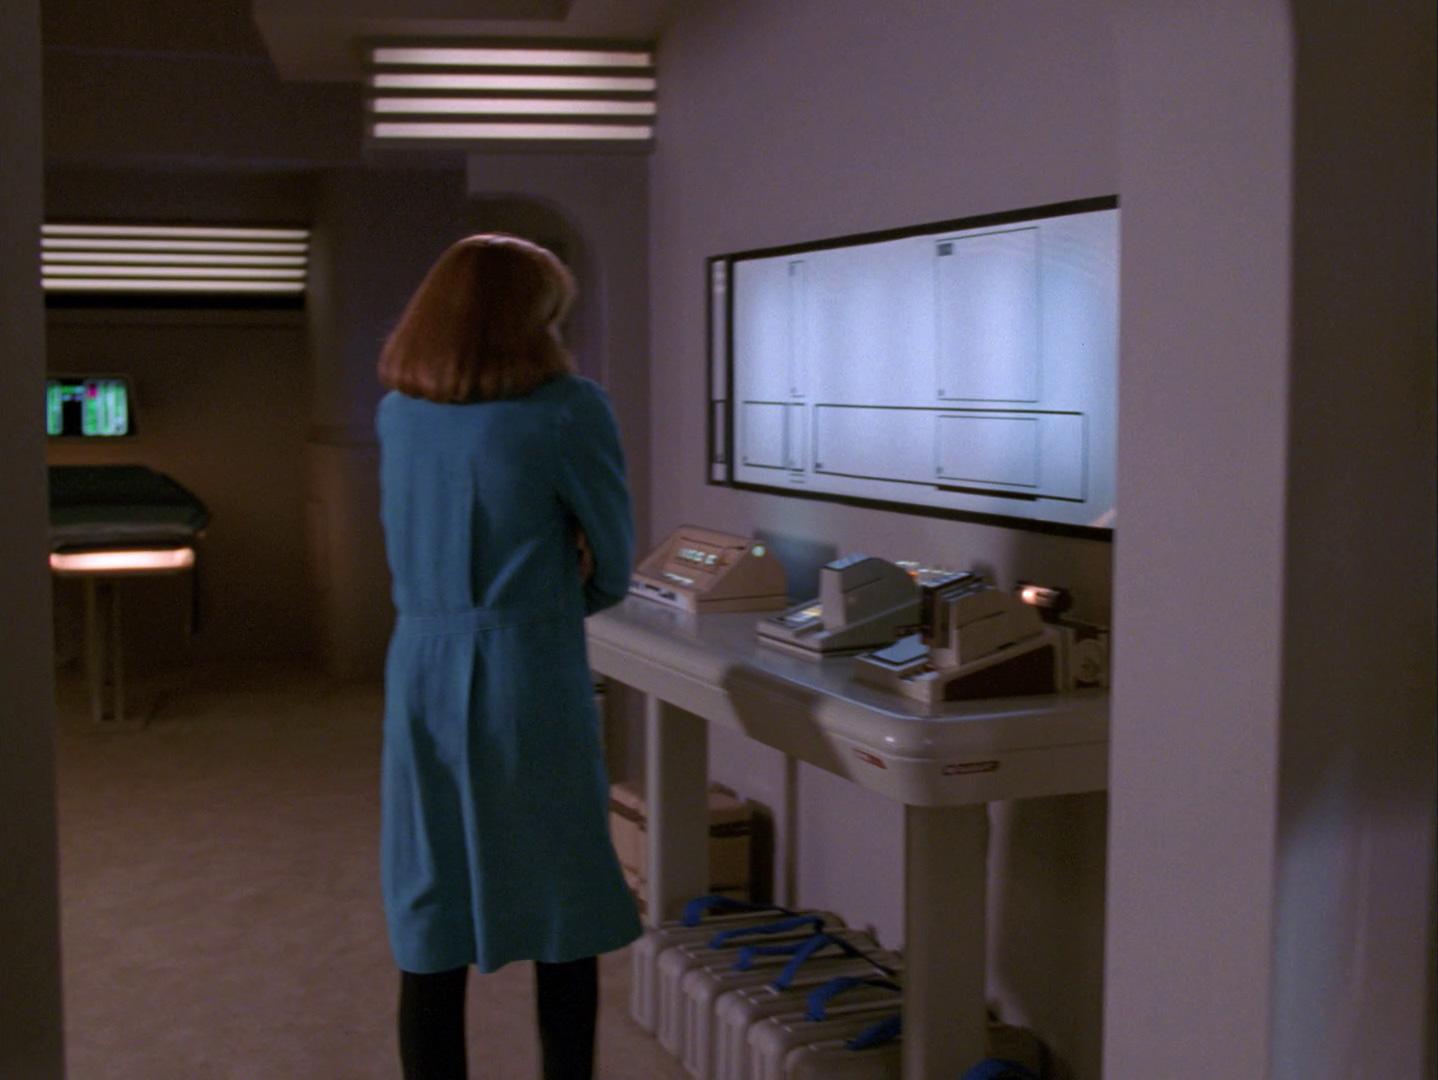 Star Trek: The Next Generation - Das Experiment (Remember Me) Blu-ray Screencap © CBS/Paramount